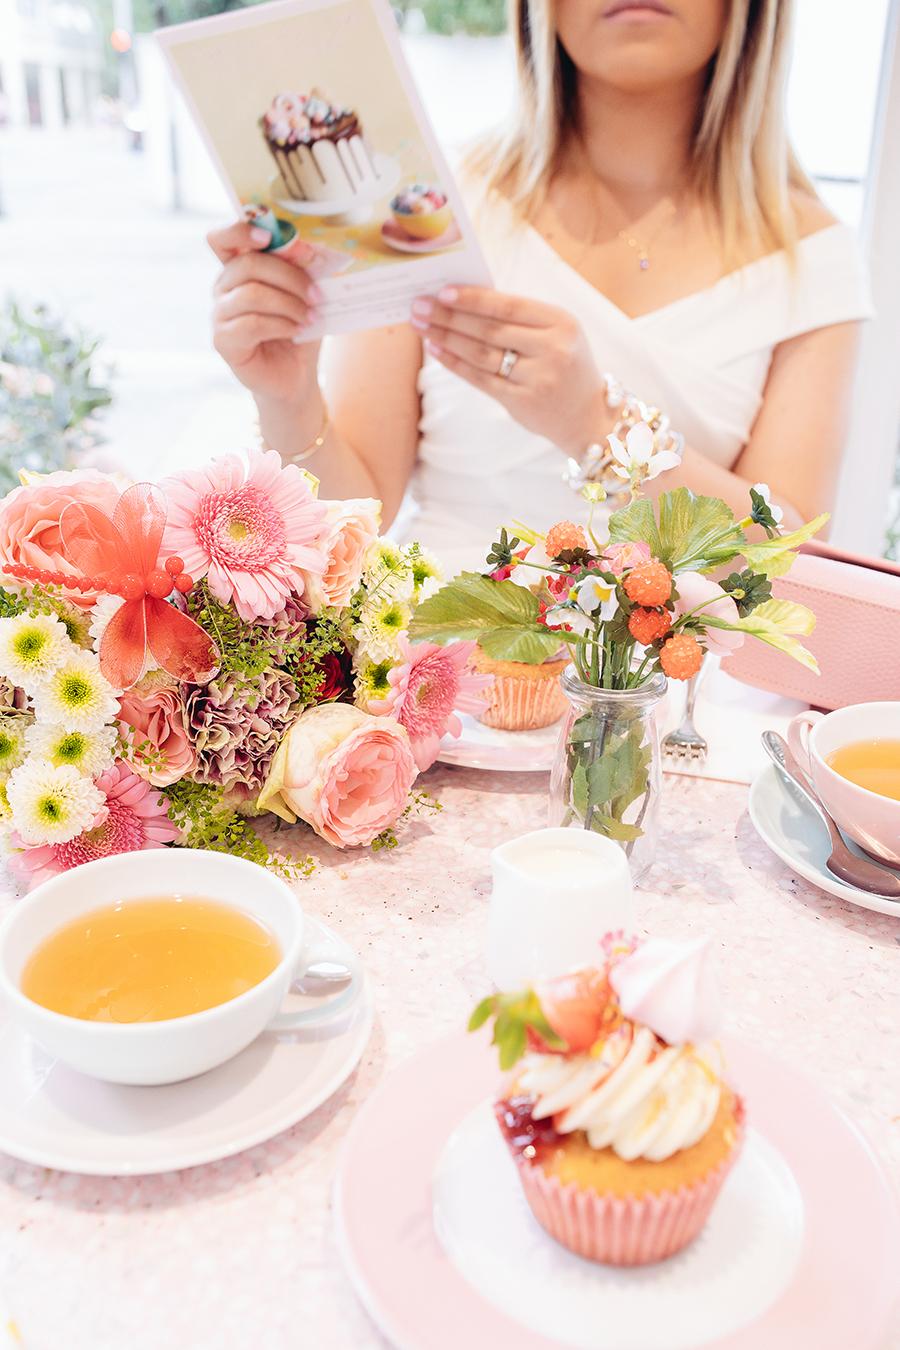 Beauitful afternoo tea